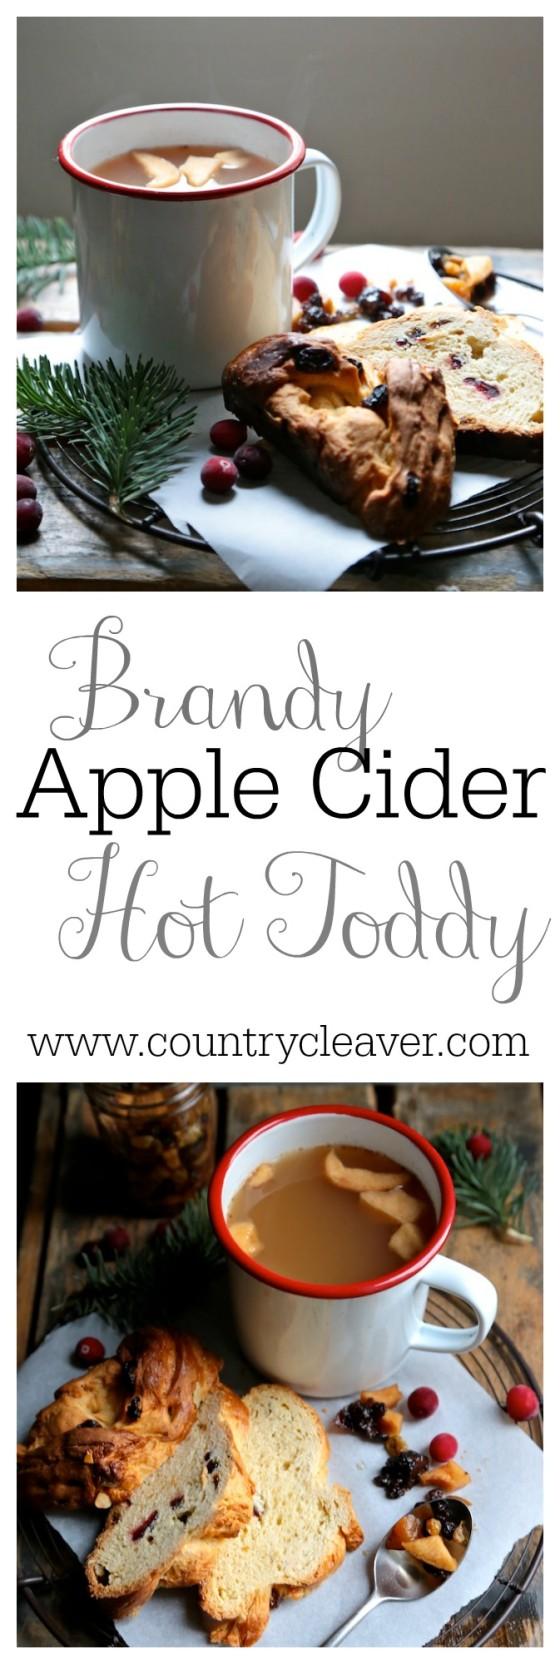 Aged Brandy Apple Cider Hot Toddy Apple cider hot toddy